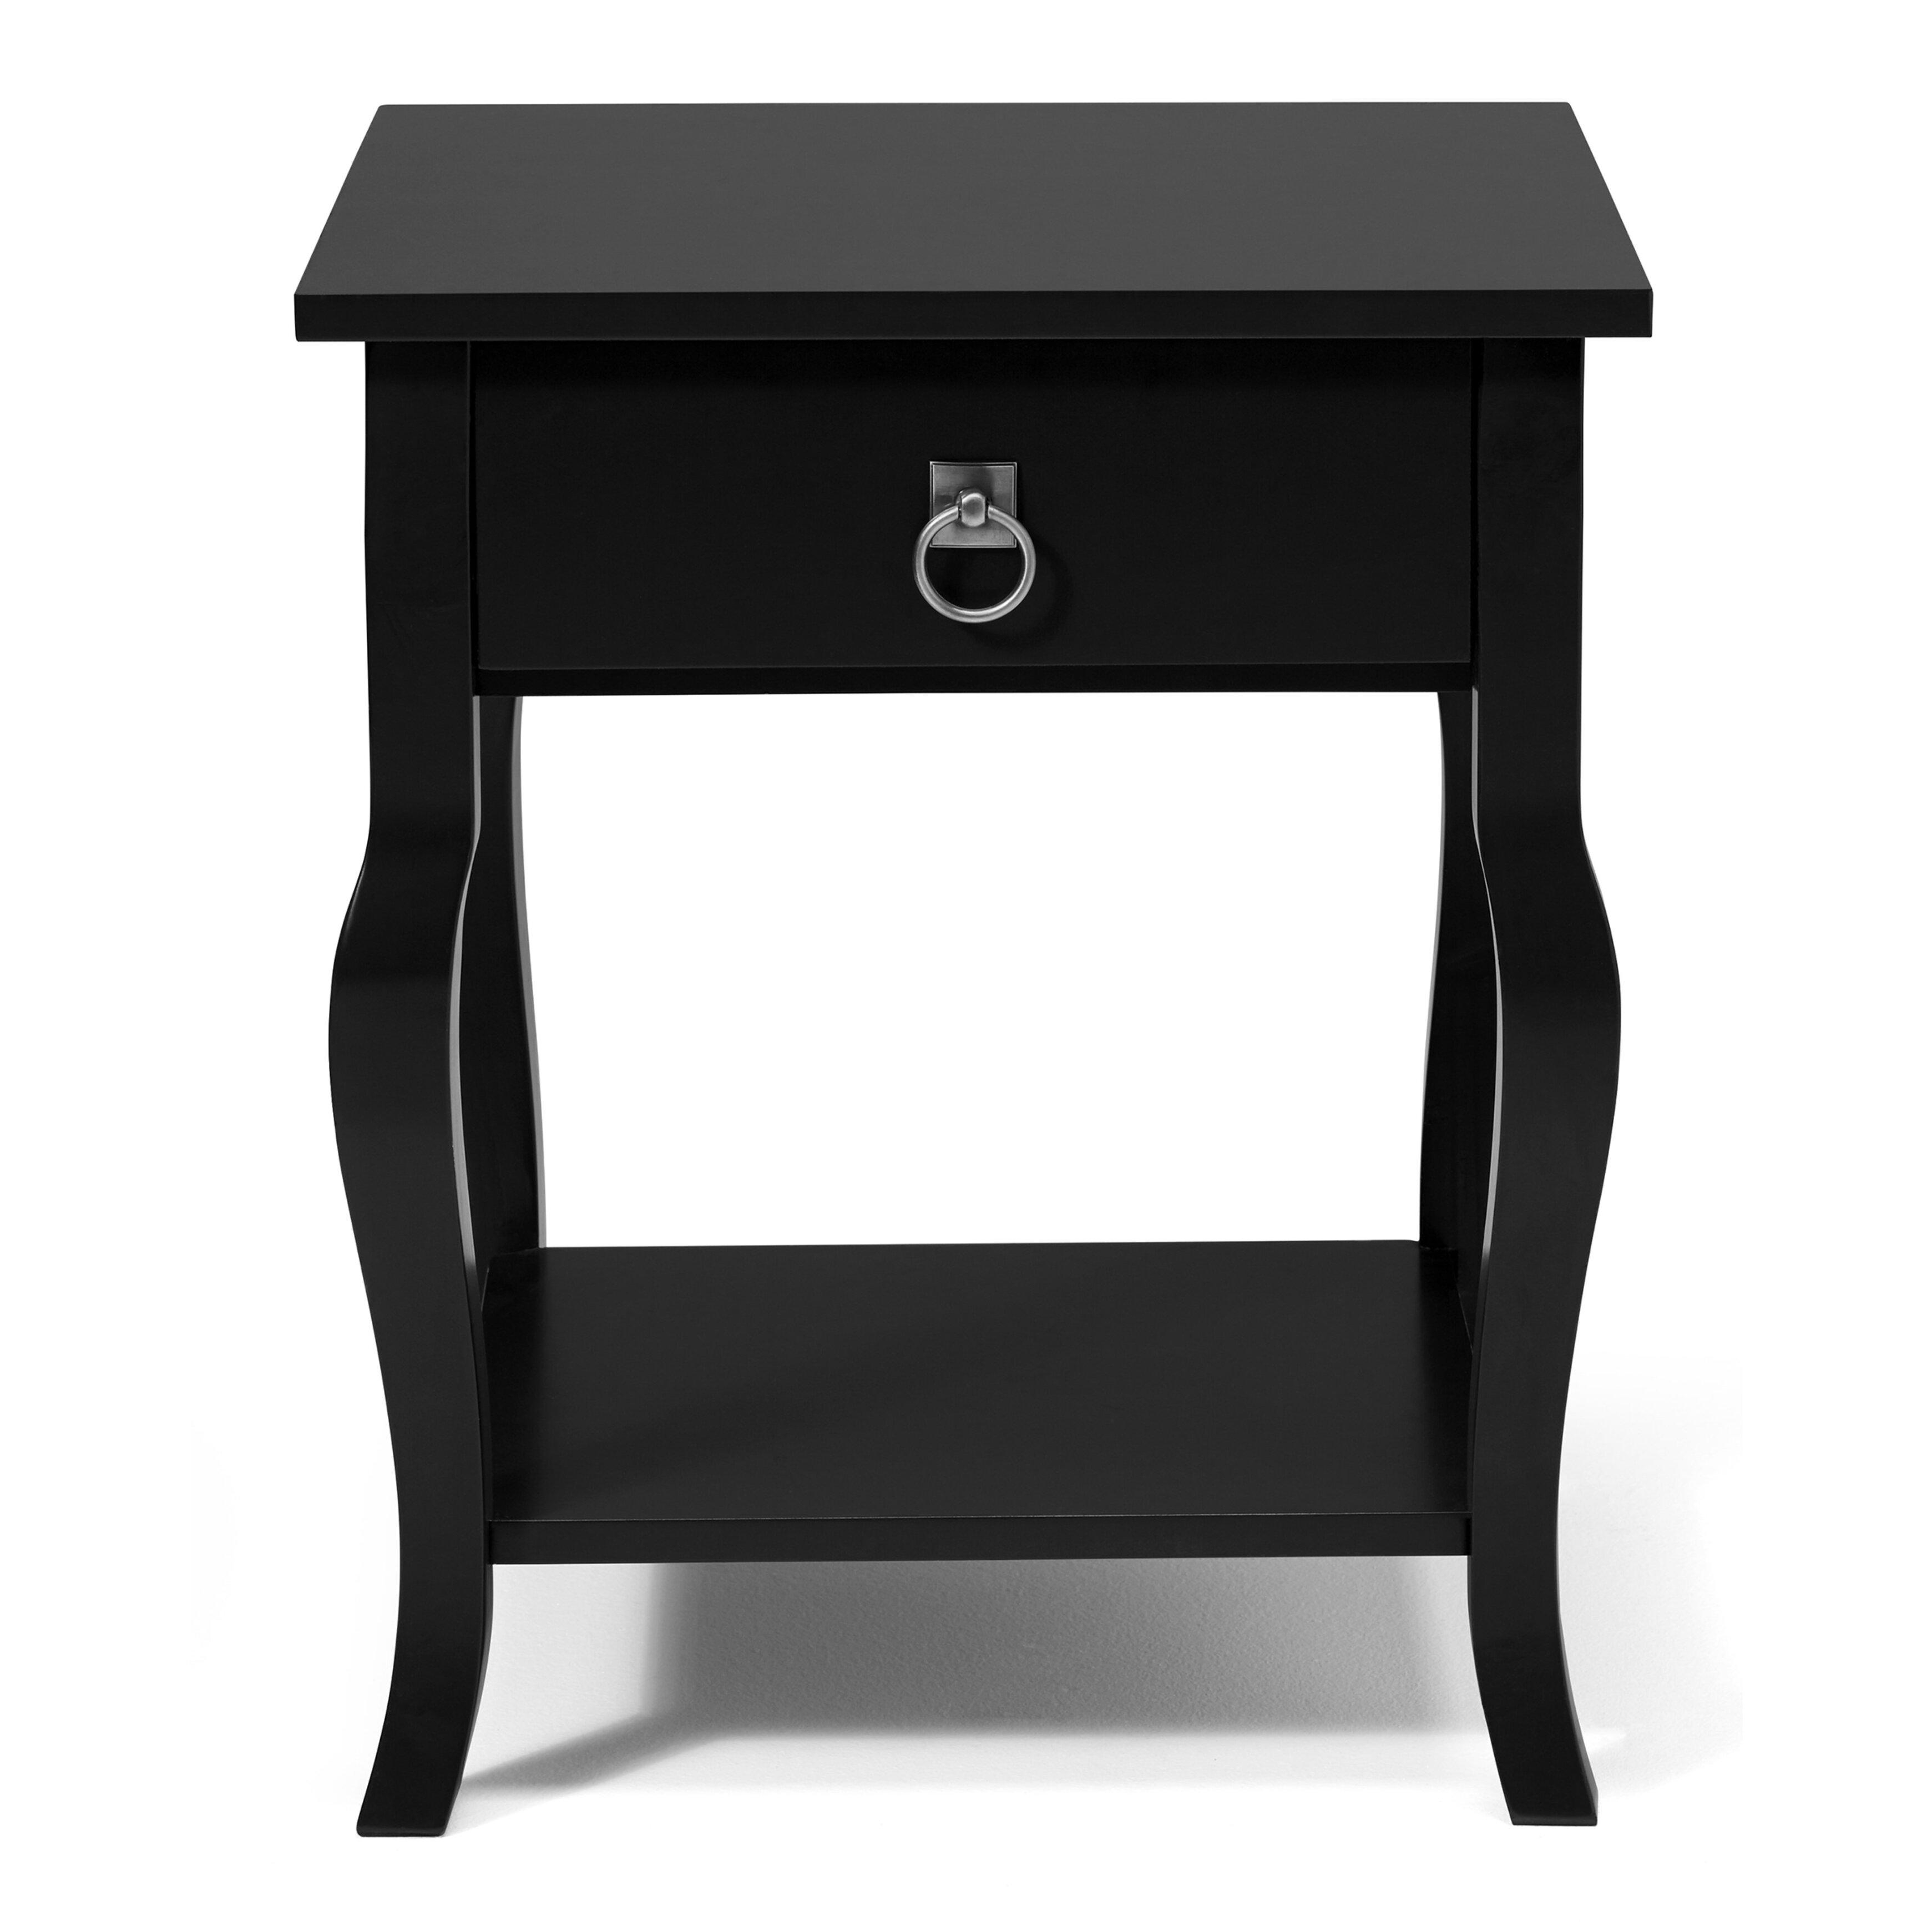 kate and laurel lillian end table reviews wayfair. Black Bedroom Furniture Sets. Home Design Ideas